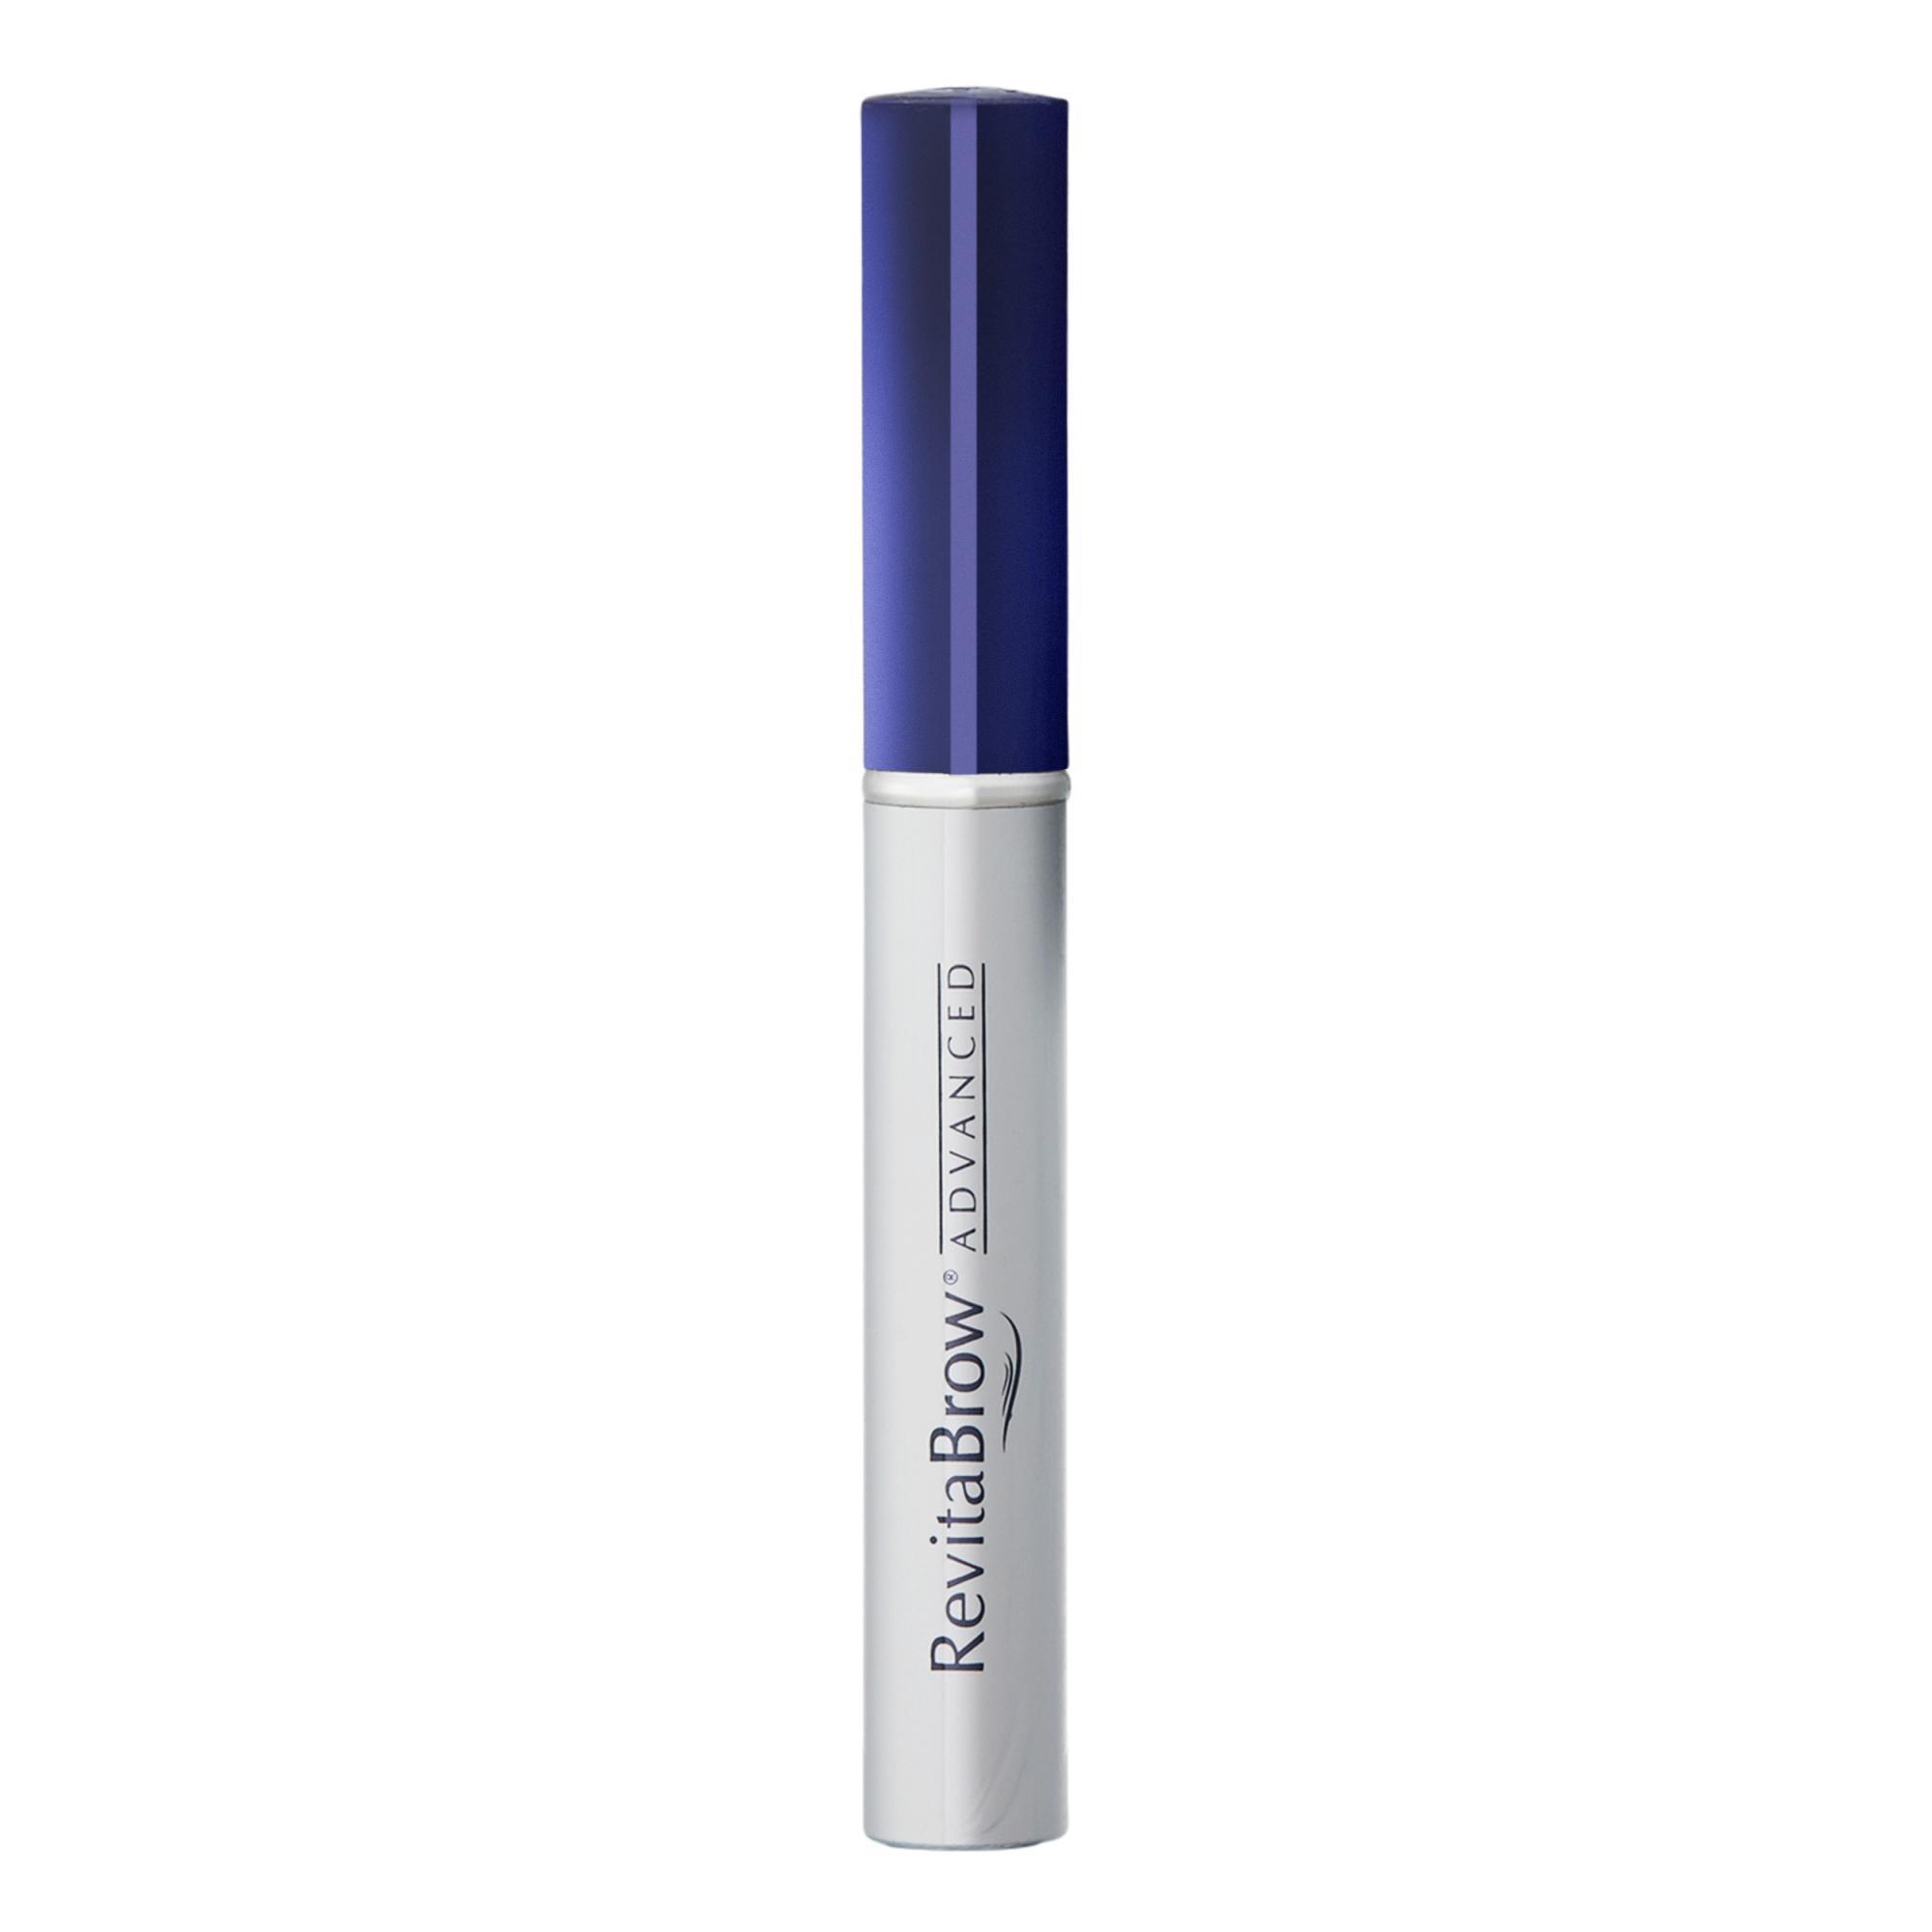 Revitalash Revitabrow Advanced Eyebrow Conditioner 3Ml 101Oz Intl Promo Code